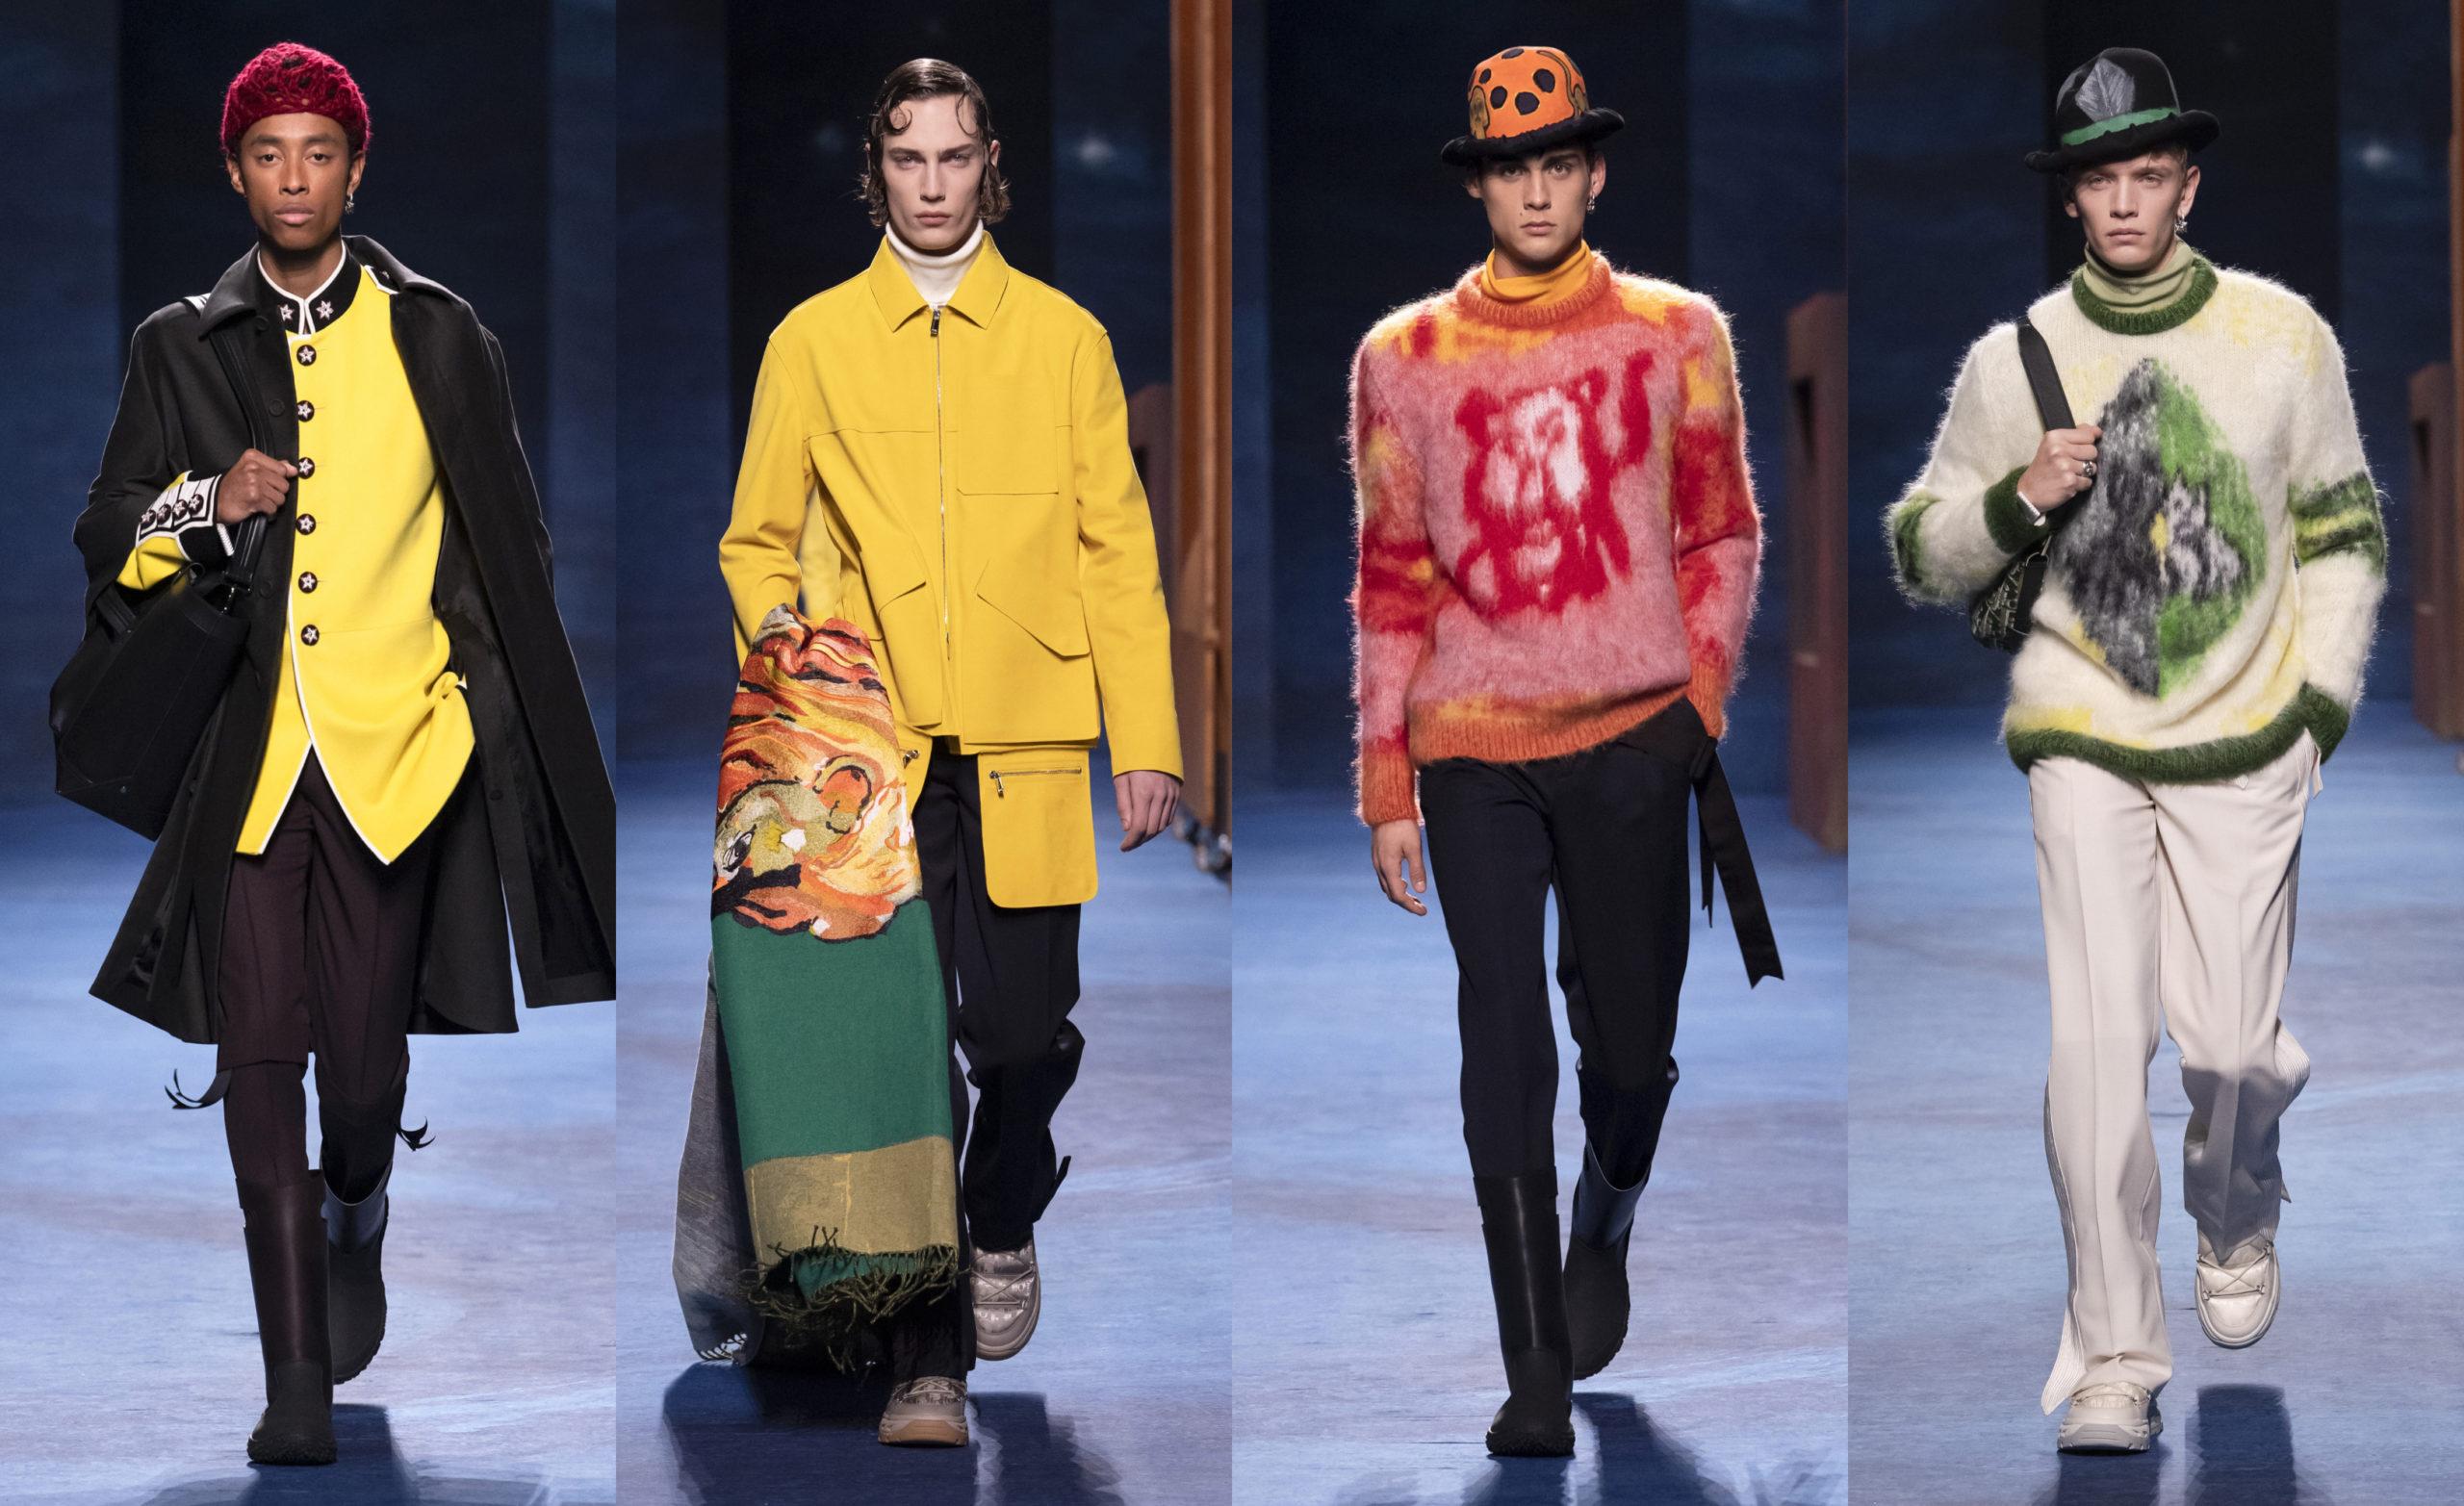 PFW: Dior Autumn/Winter 2021 Collection